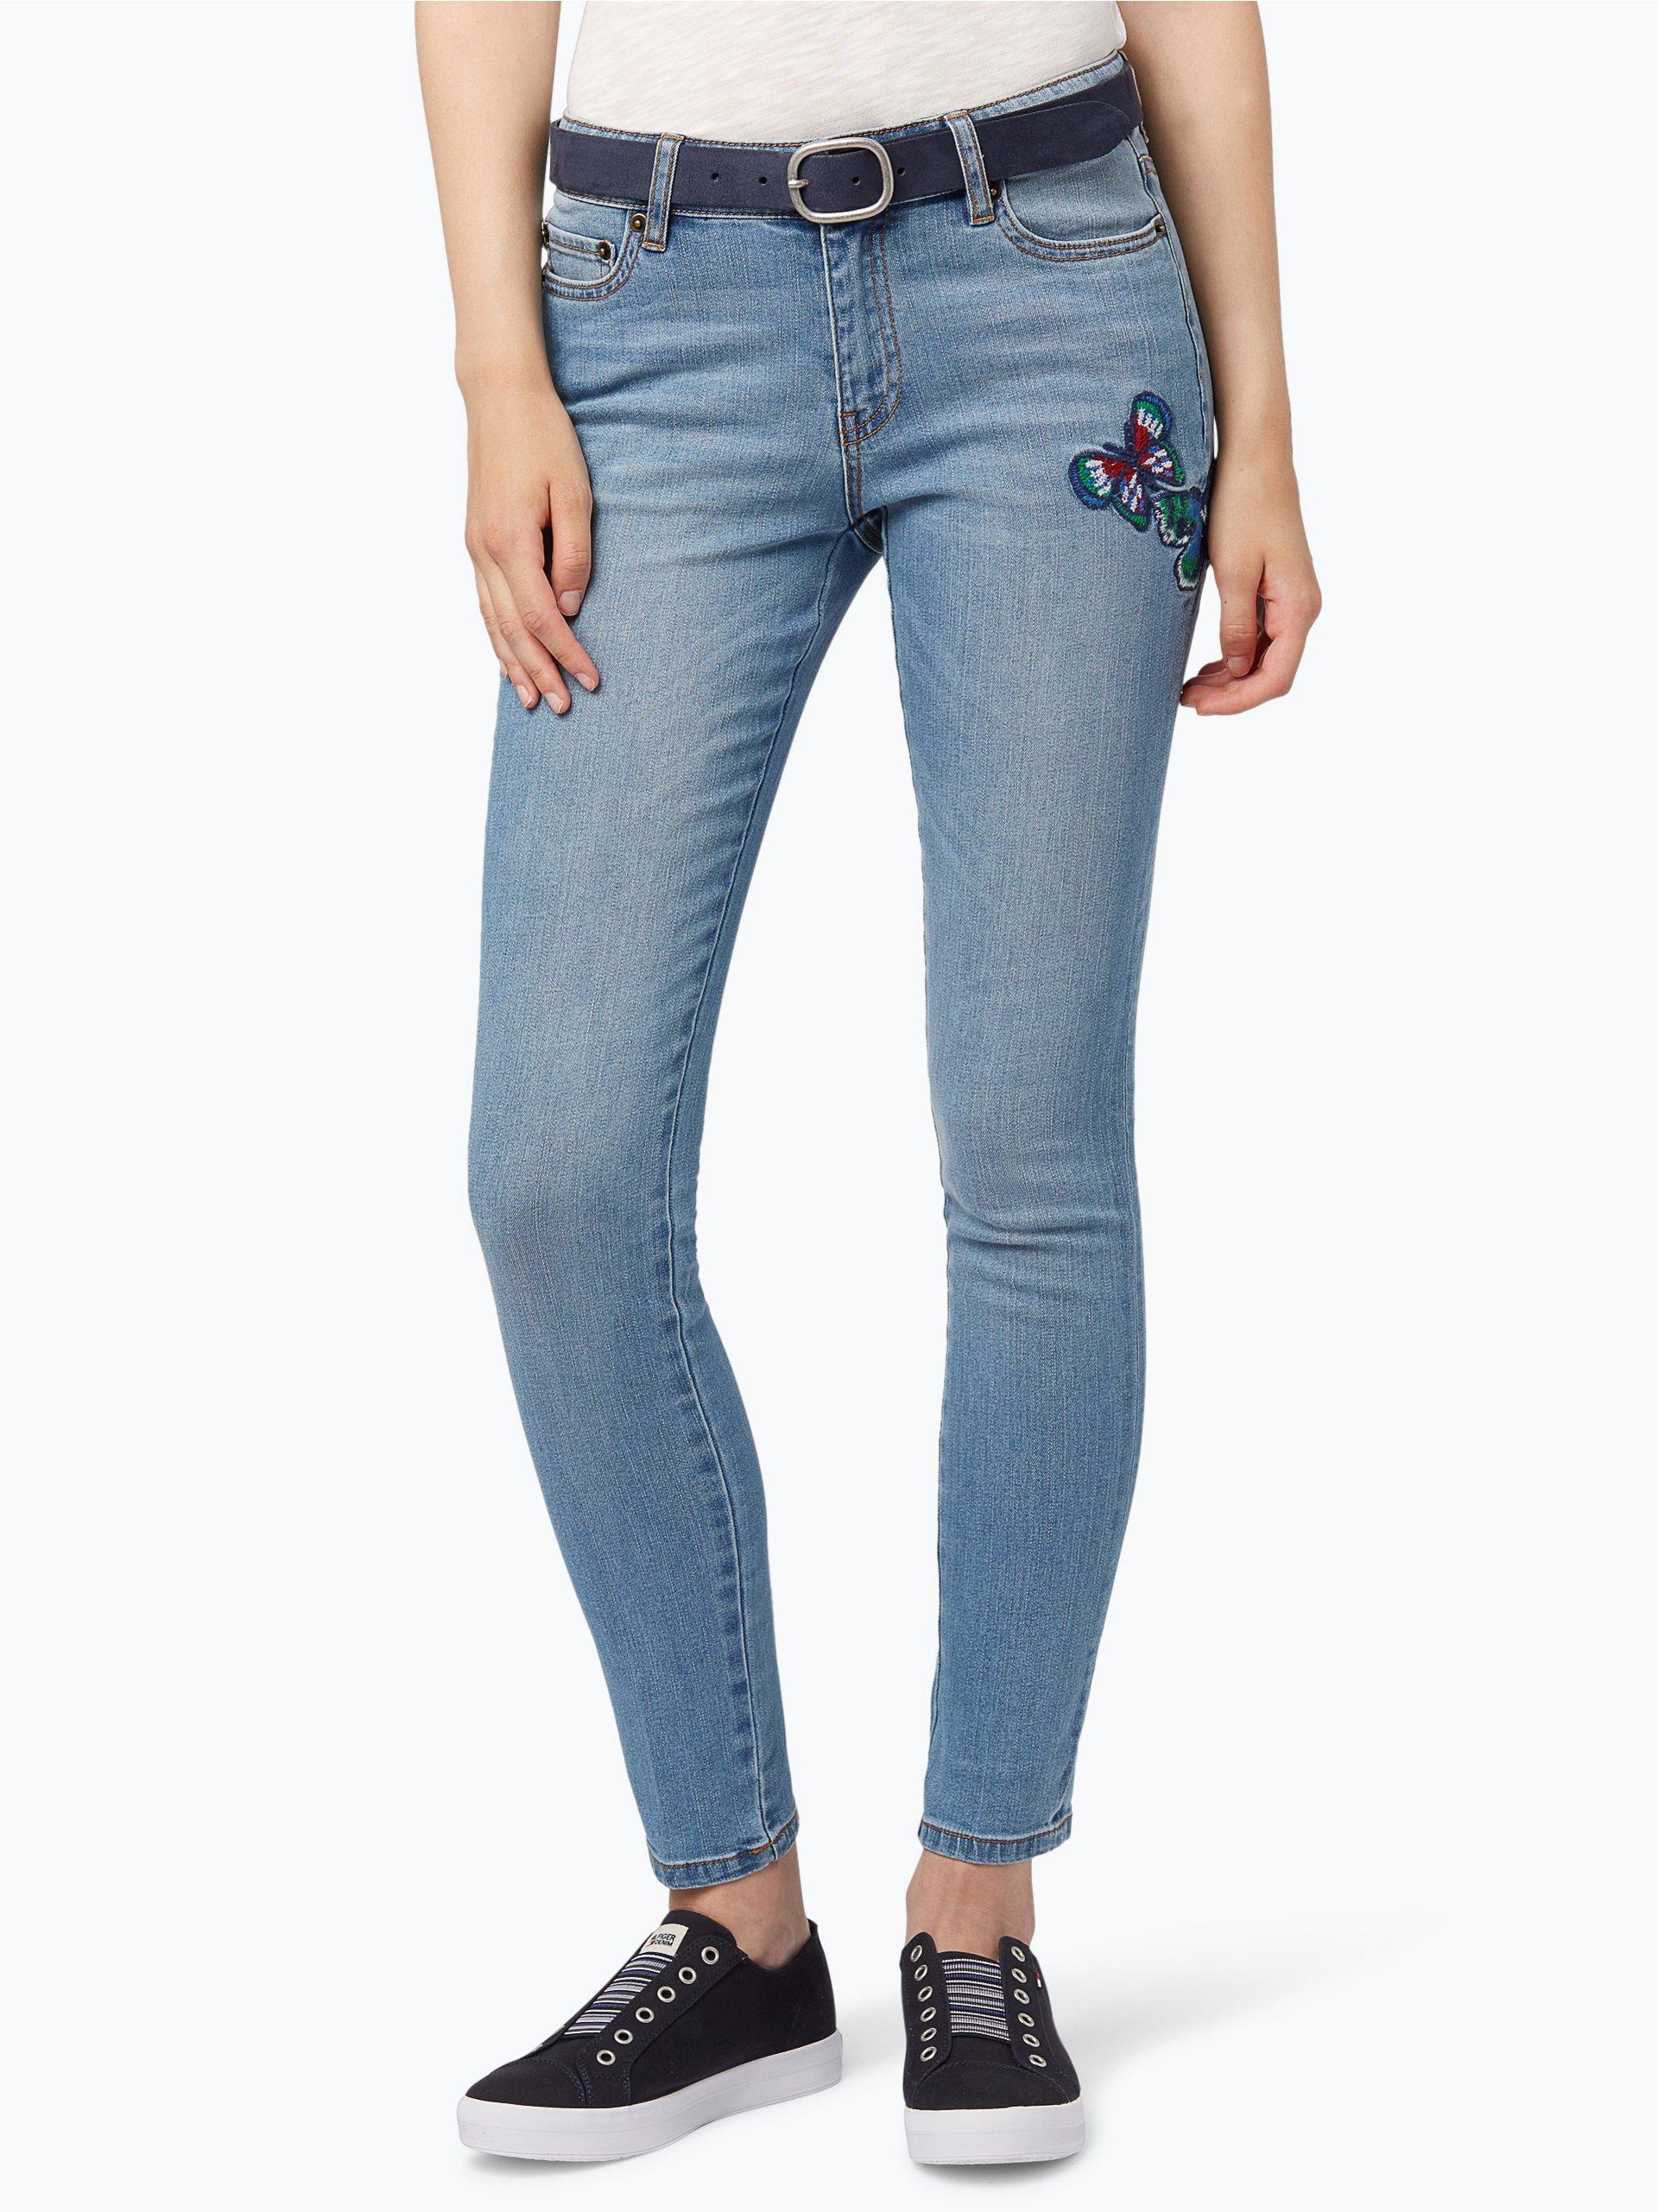 Marie Lund Damen Jeans